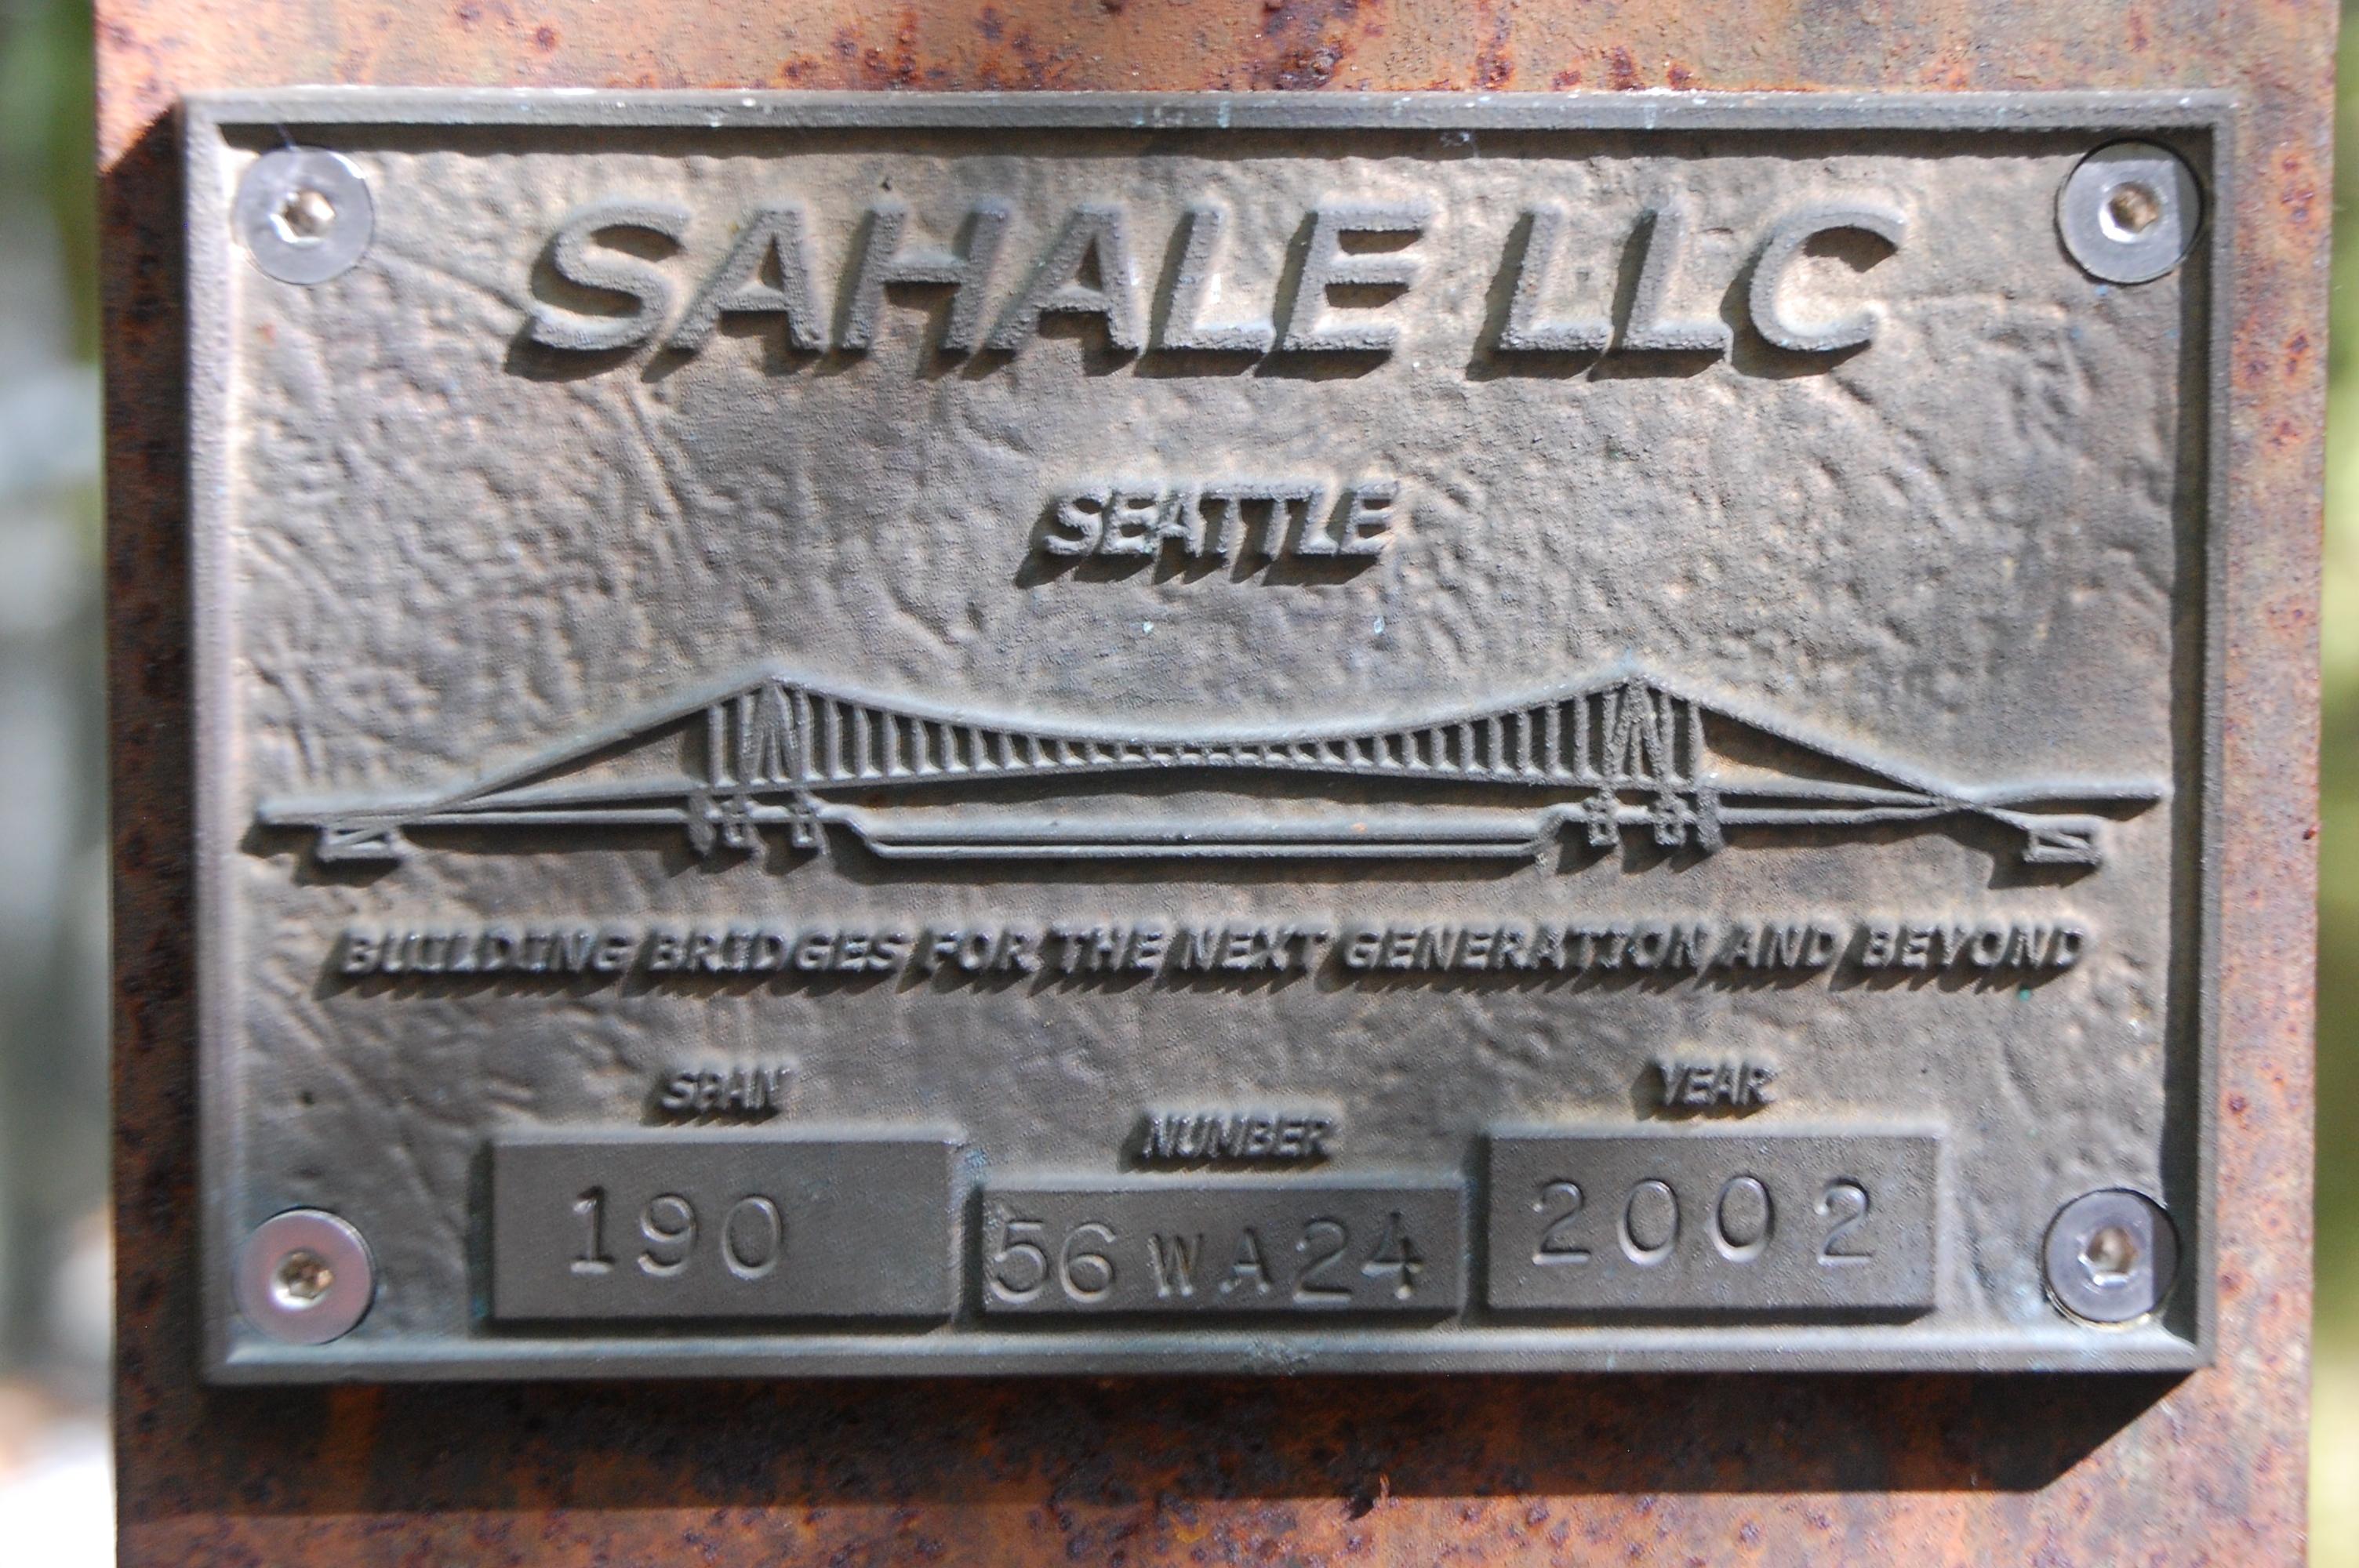 Brought to you by Sahale, LLC suspension bridges company.